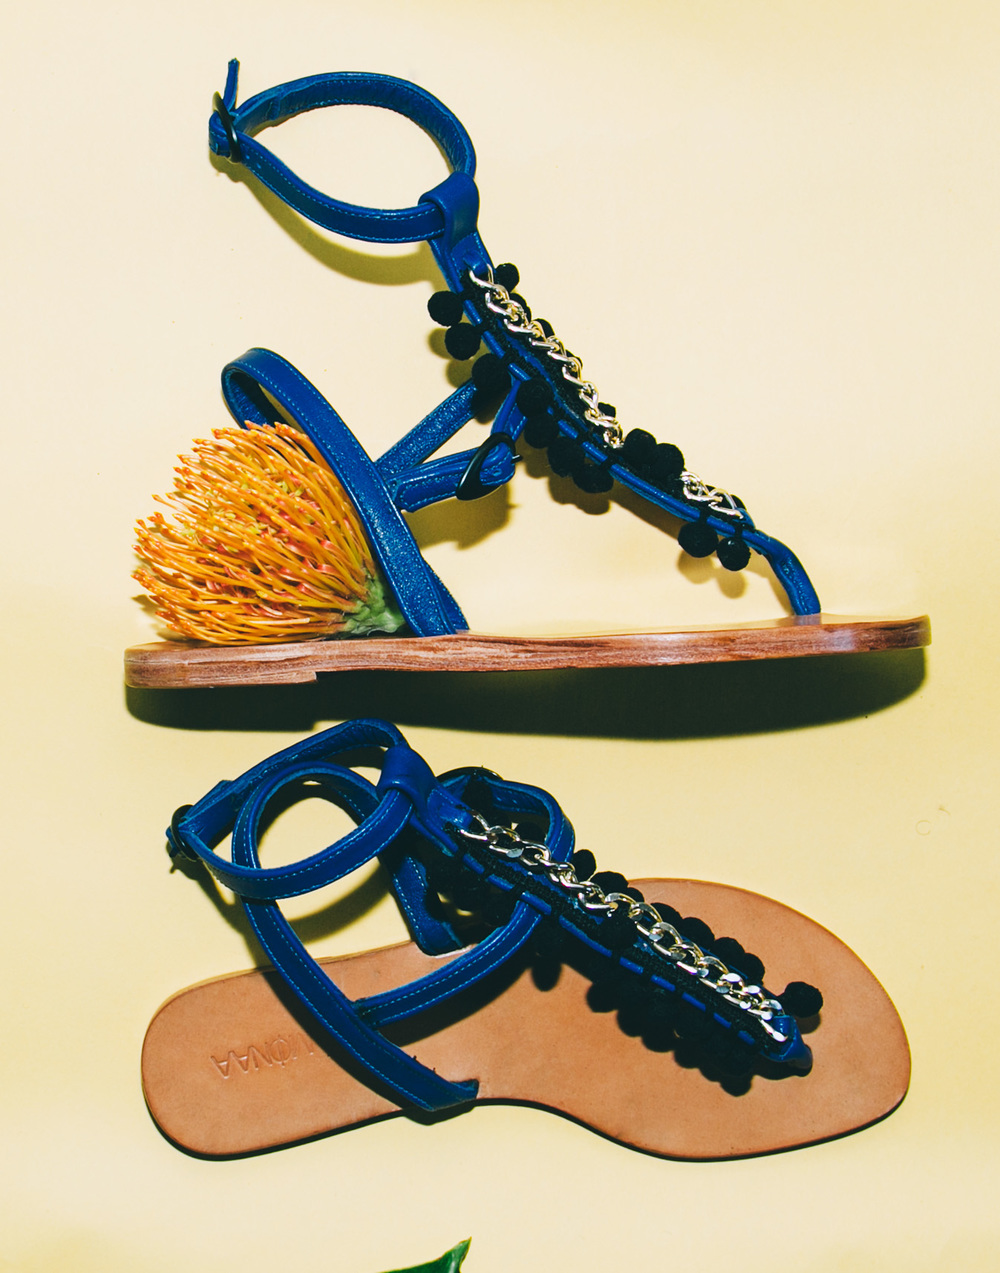 shoes-046.jpg